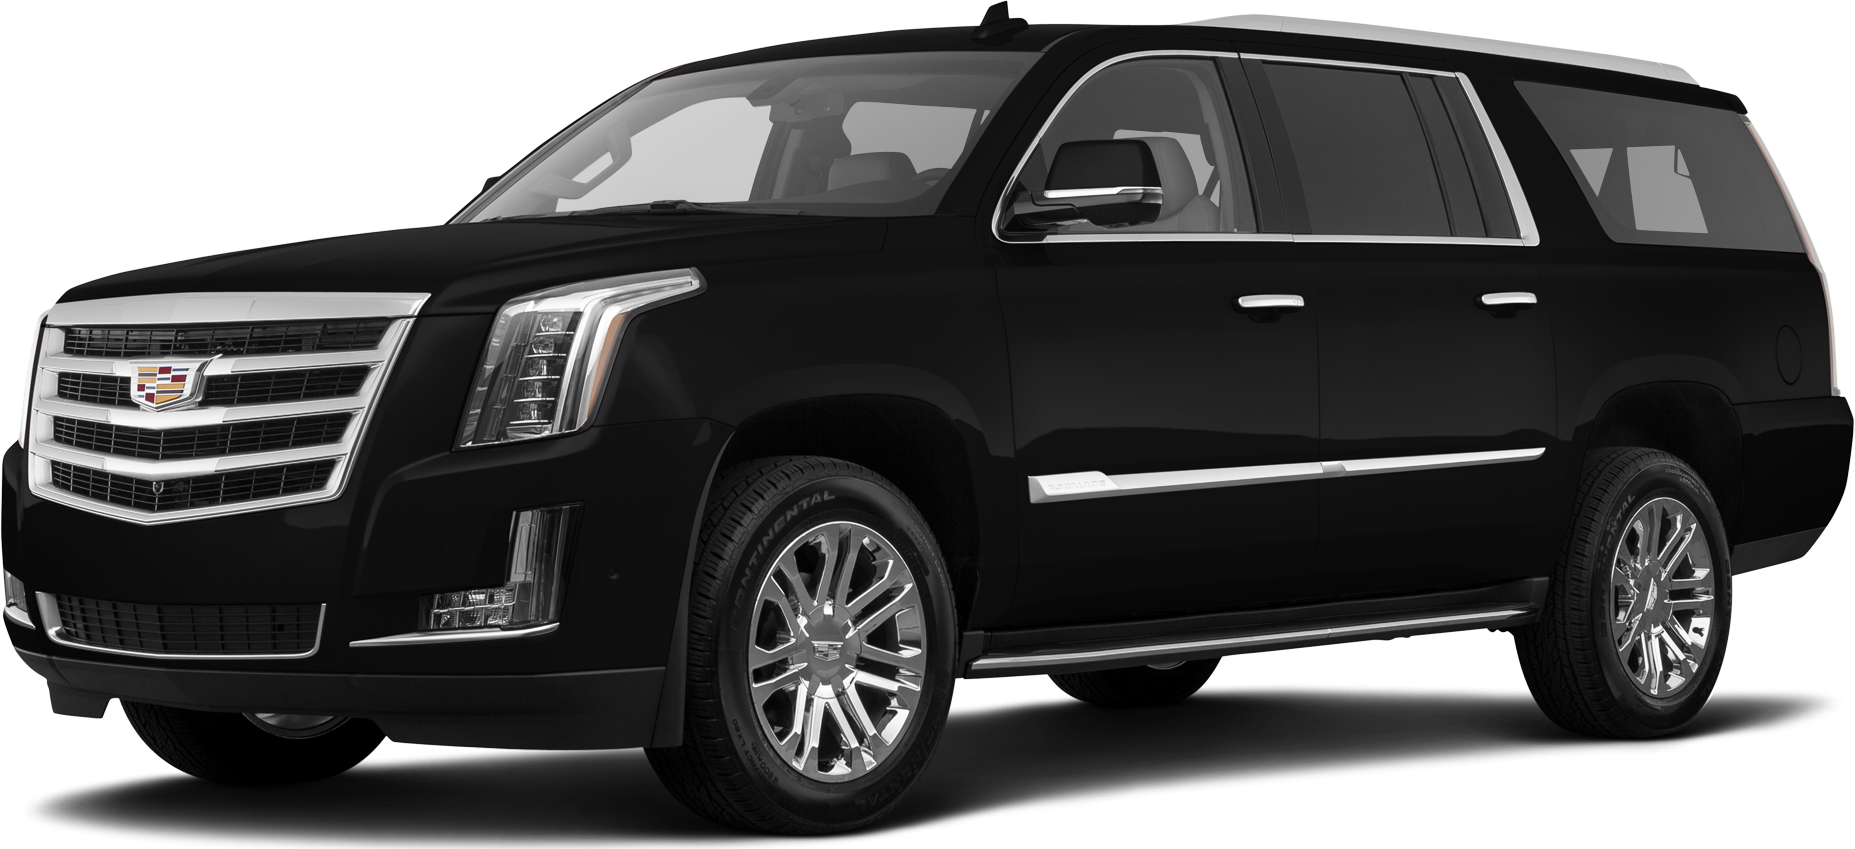 Chicago Limo SUV, SUV Car Service Chicago, SUV Limo Chicago, SUV Chicago Limo, Lincoln Navigator, SUV Service Chicago, Black Car Service, Private Car Service Chicago, Luxury SUV